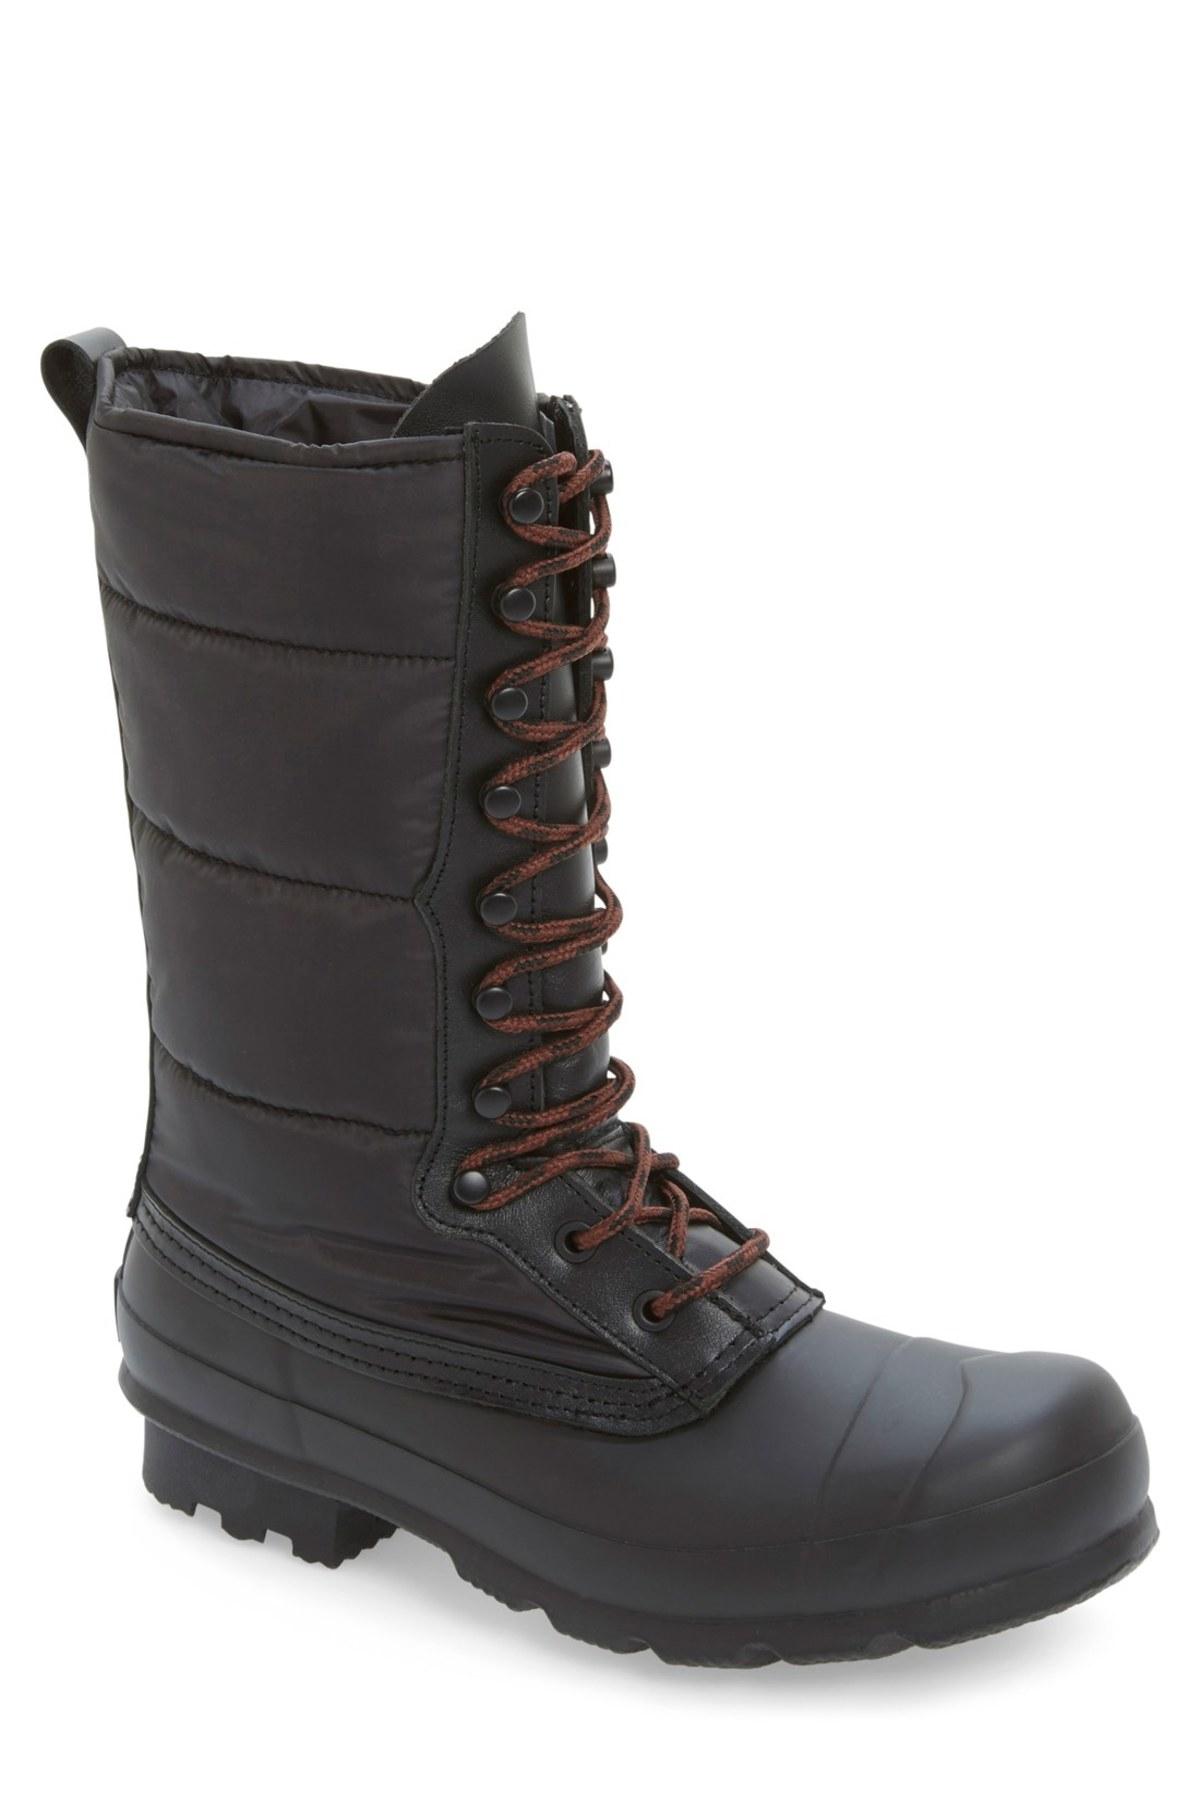 6e6019b99a3 Nordstrom Rack Men s Winter Boots